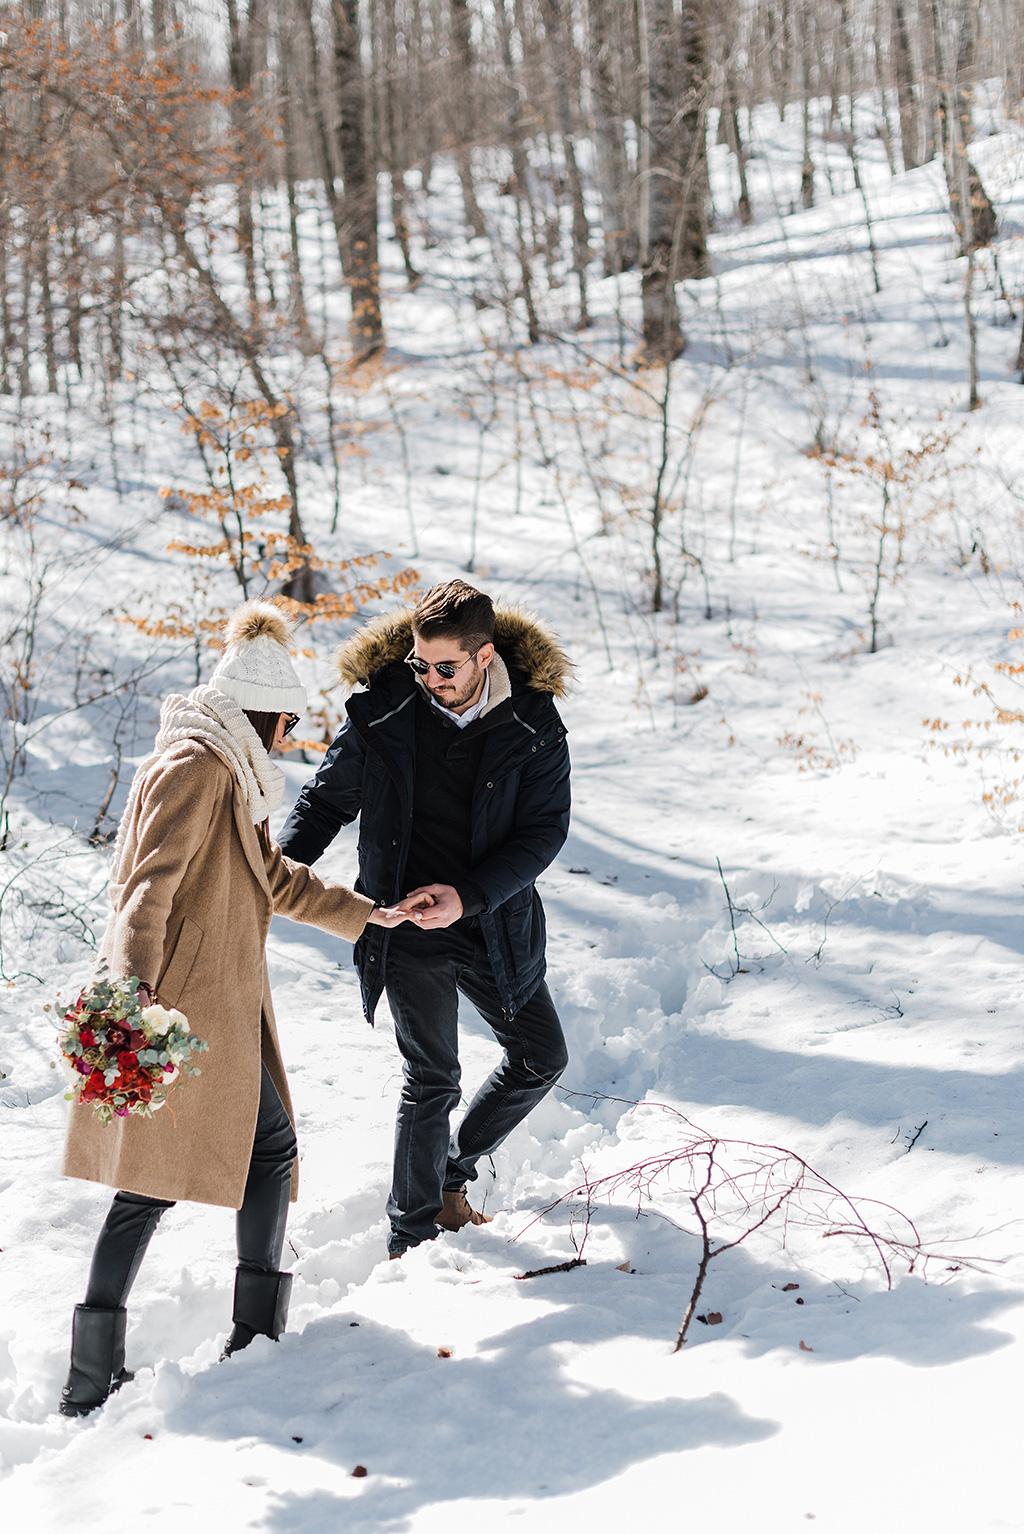 Engagement in the snow fields, Prewedding φωτογράφιση στα χιόνια, μια υπέροχη εμπειρία για το ζευγάρι, George Kostopoulos Fine Art Wedding Photography